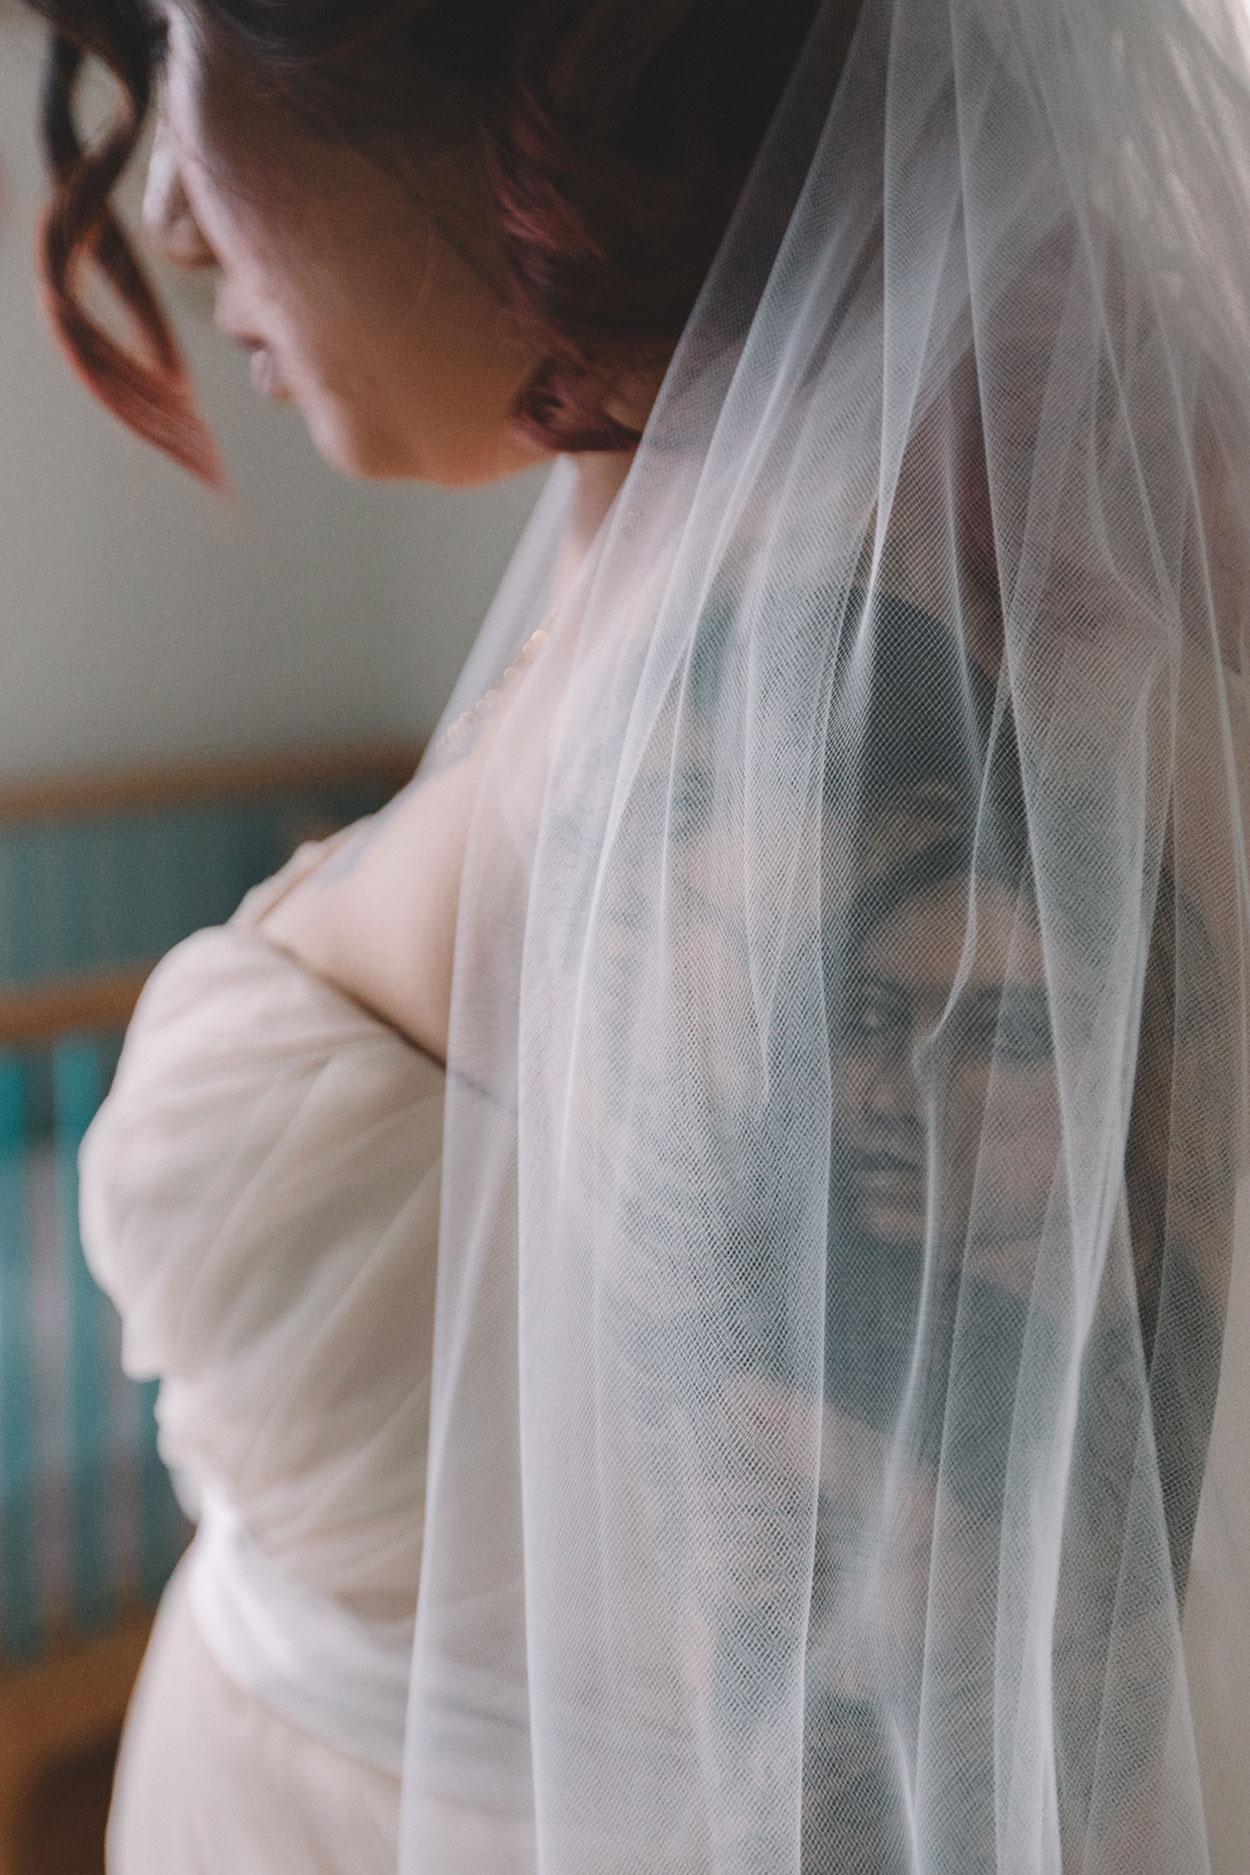 Tattoo Bride, Sunshine Coast, Australian Pre Wedding Destination Photographer Packages - Flaxton, Queensland Photography Packages